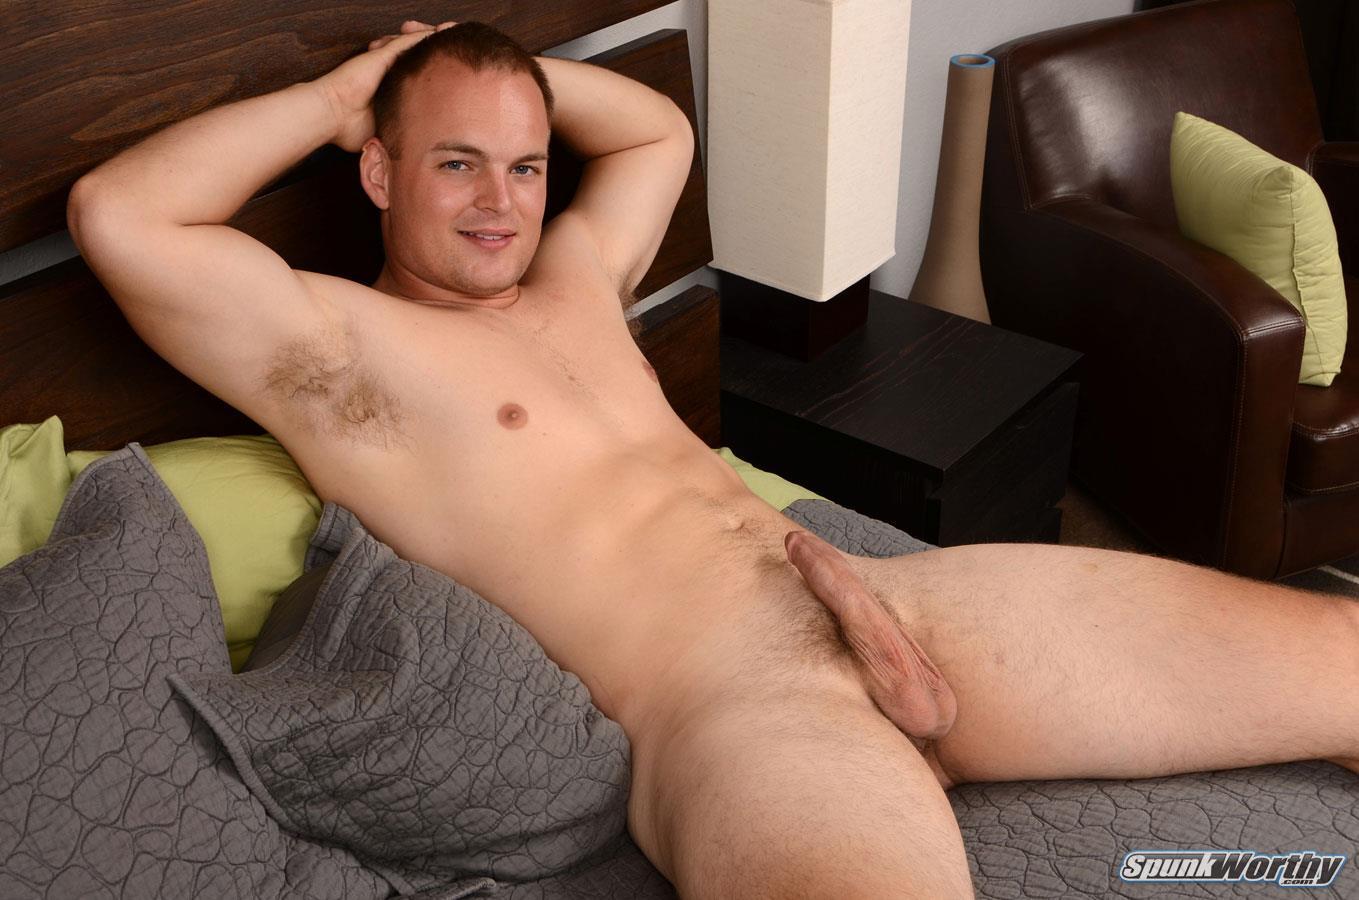 SpunkWorthy-Cole-Beefy-Young-Marine-Jerking-Off-His-Big-Cock-Masturbation-Amateur-Gay-Porn-07 Amateur Beefy Straight Young Marine Jerking Off